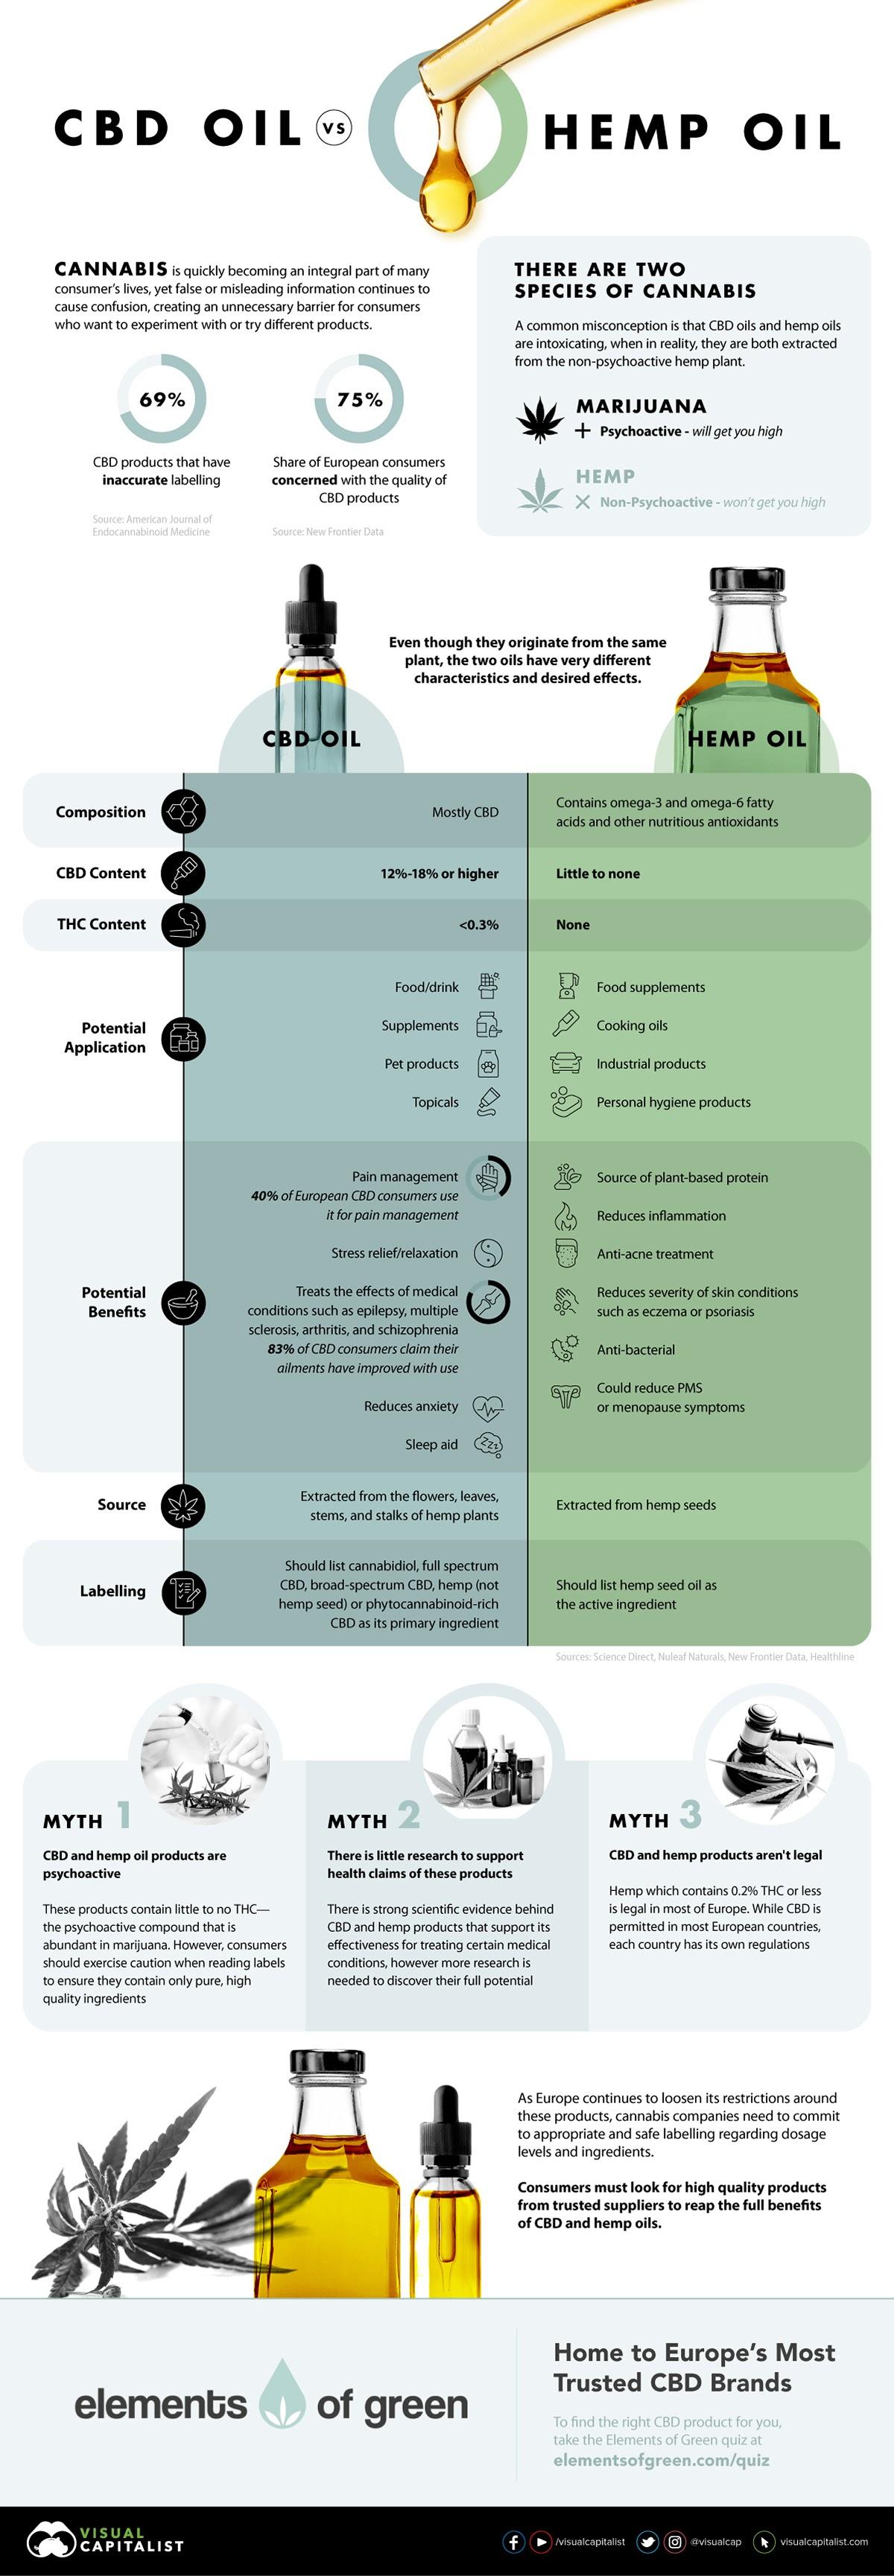 CBD Oil vs. Hemp Oil #infographic